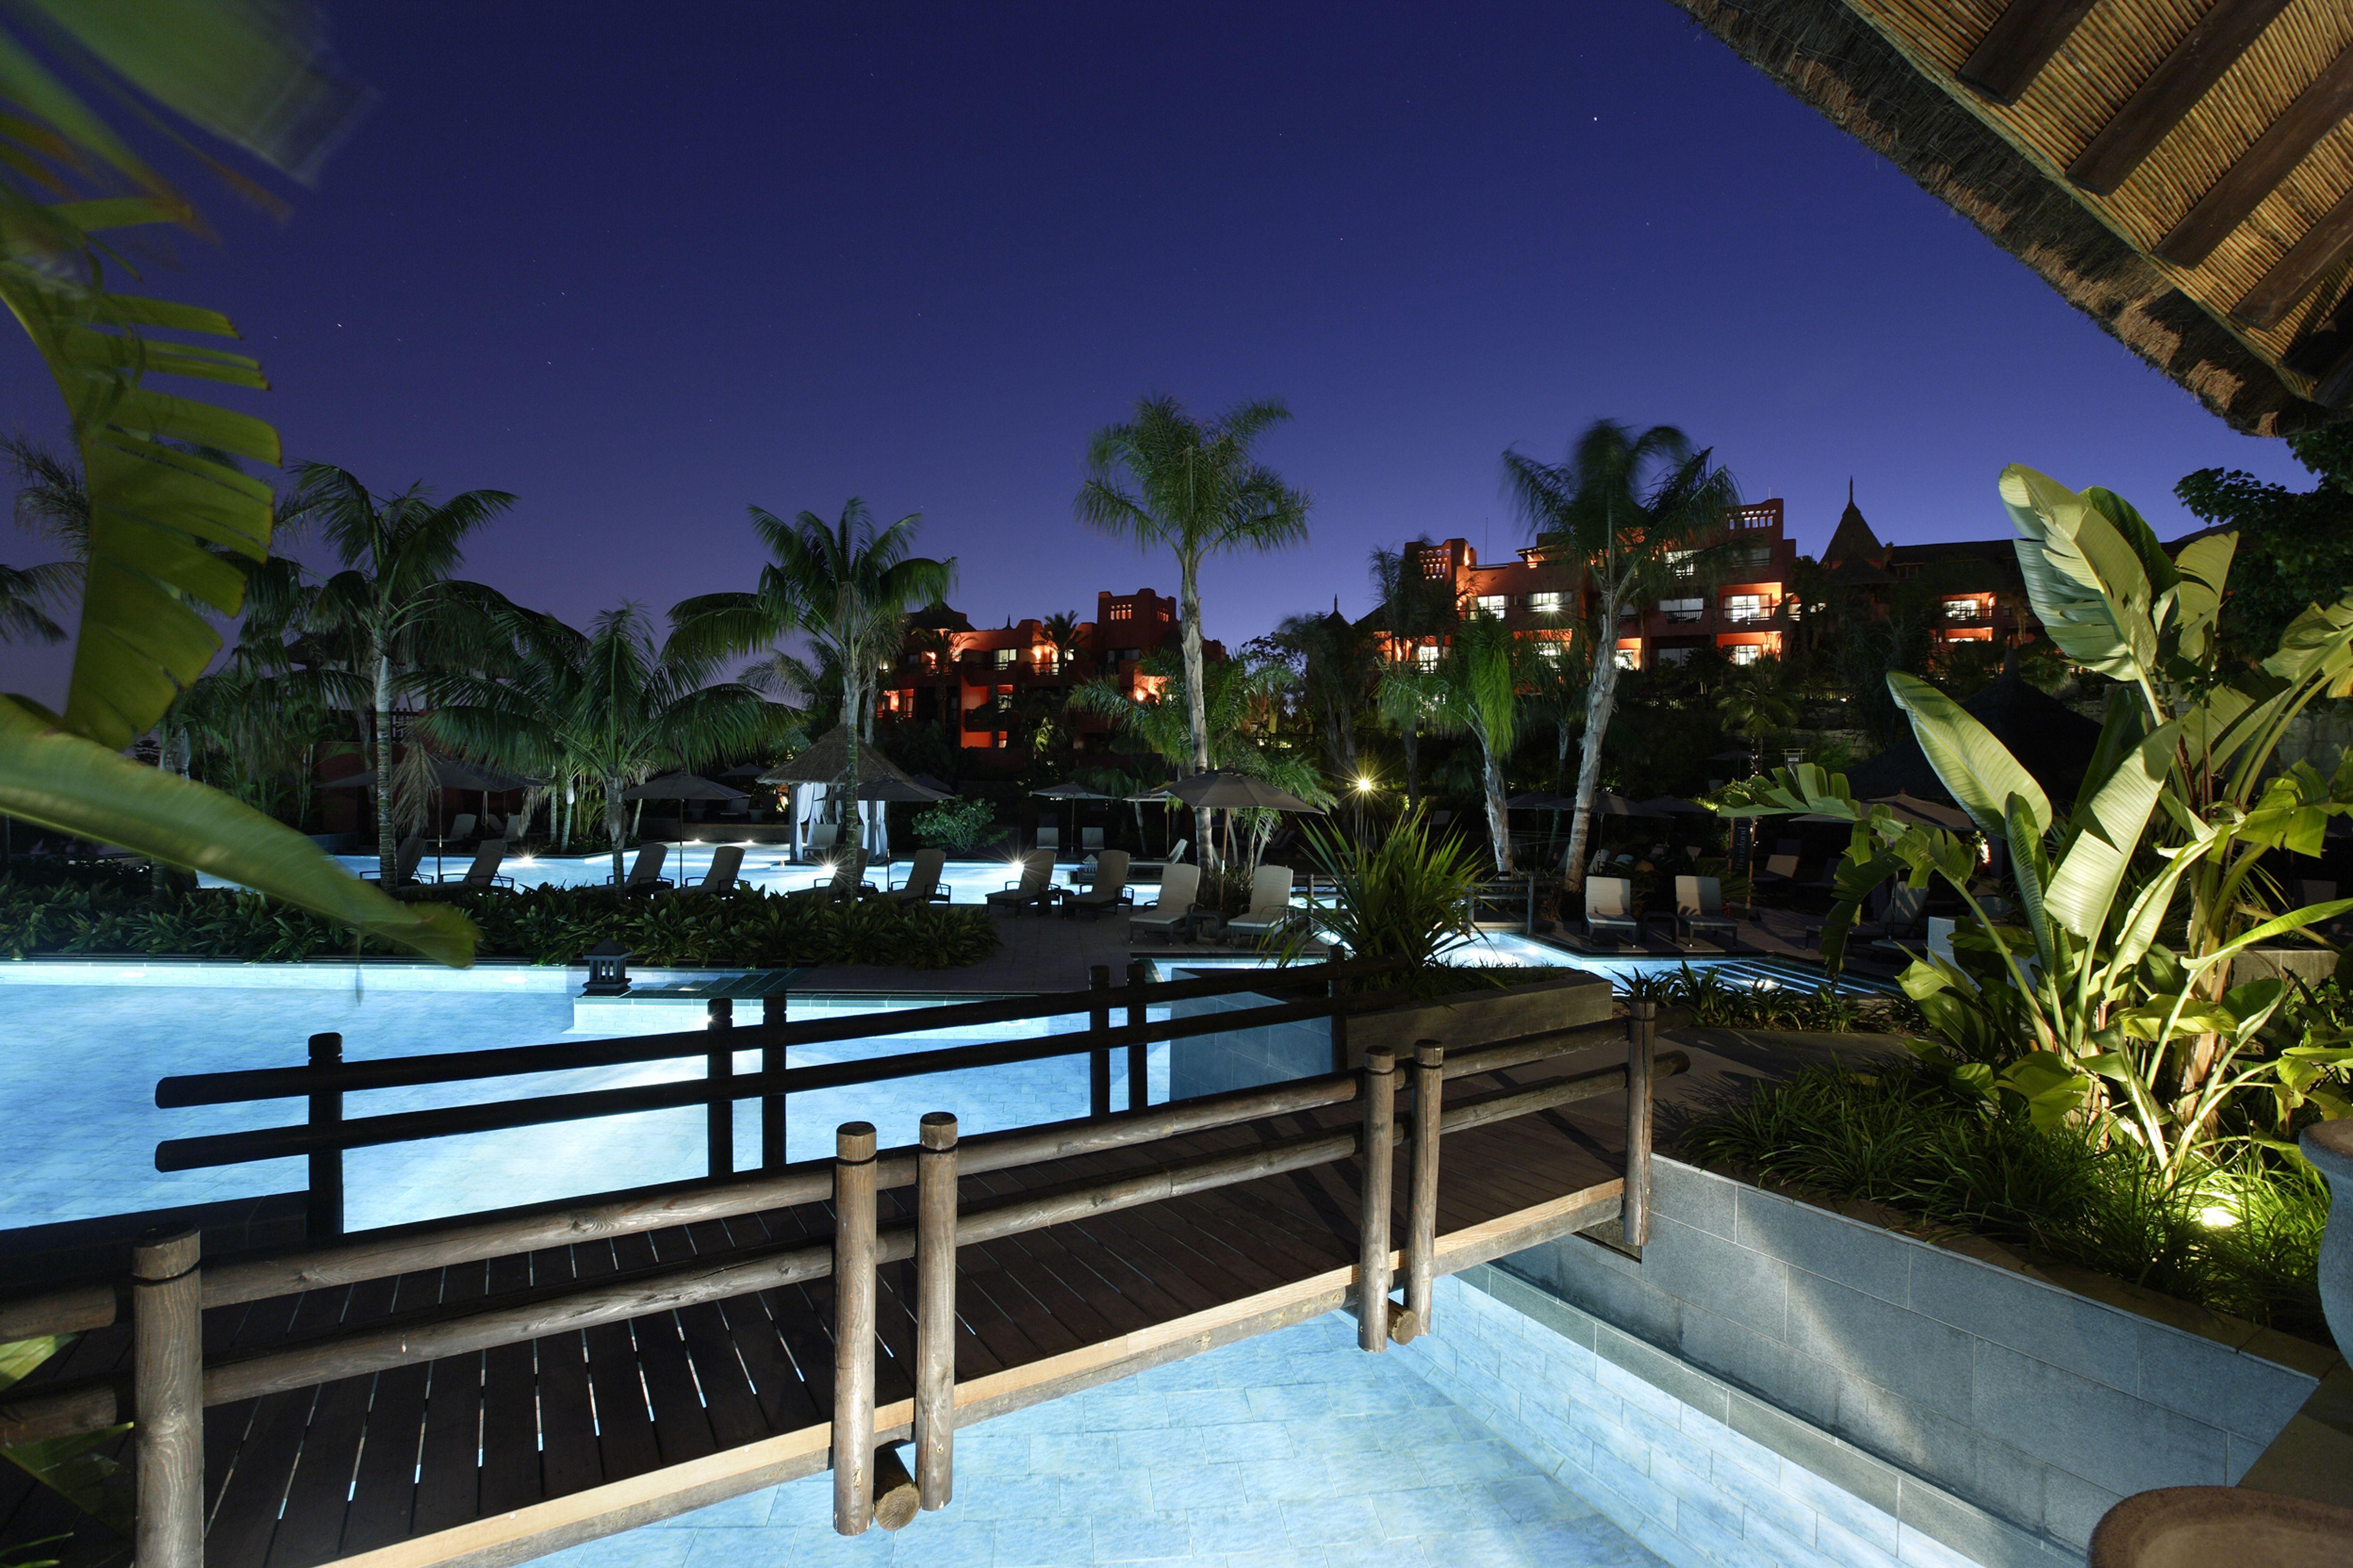 c5599c4c073574e8cd30be5737ef0723 - Asia Gardens Hotel And Thai Spa Benidorm